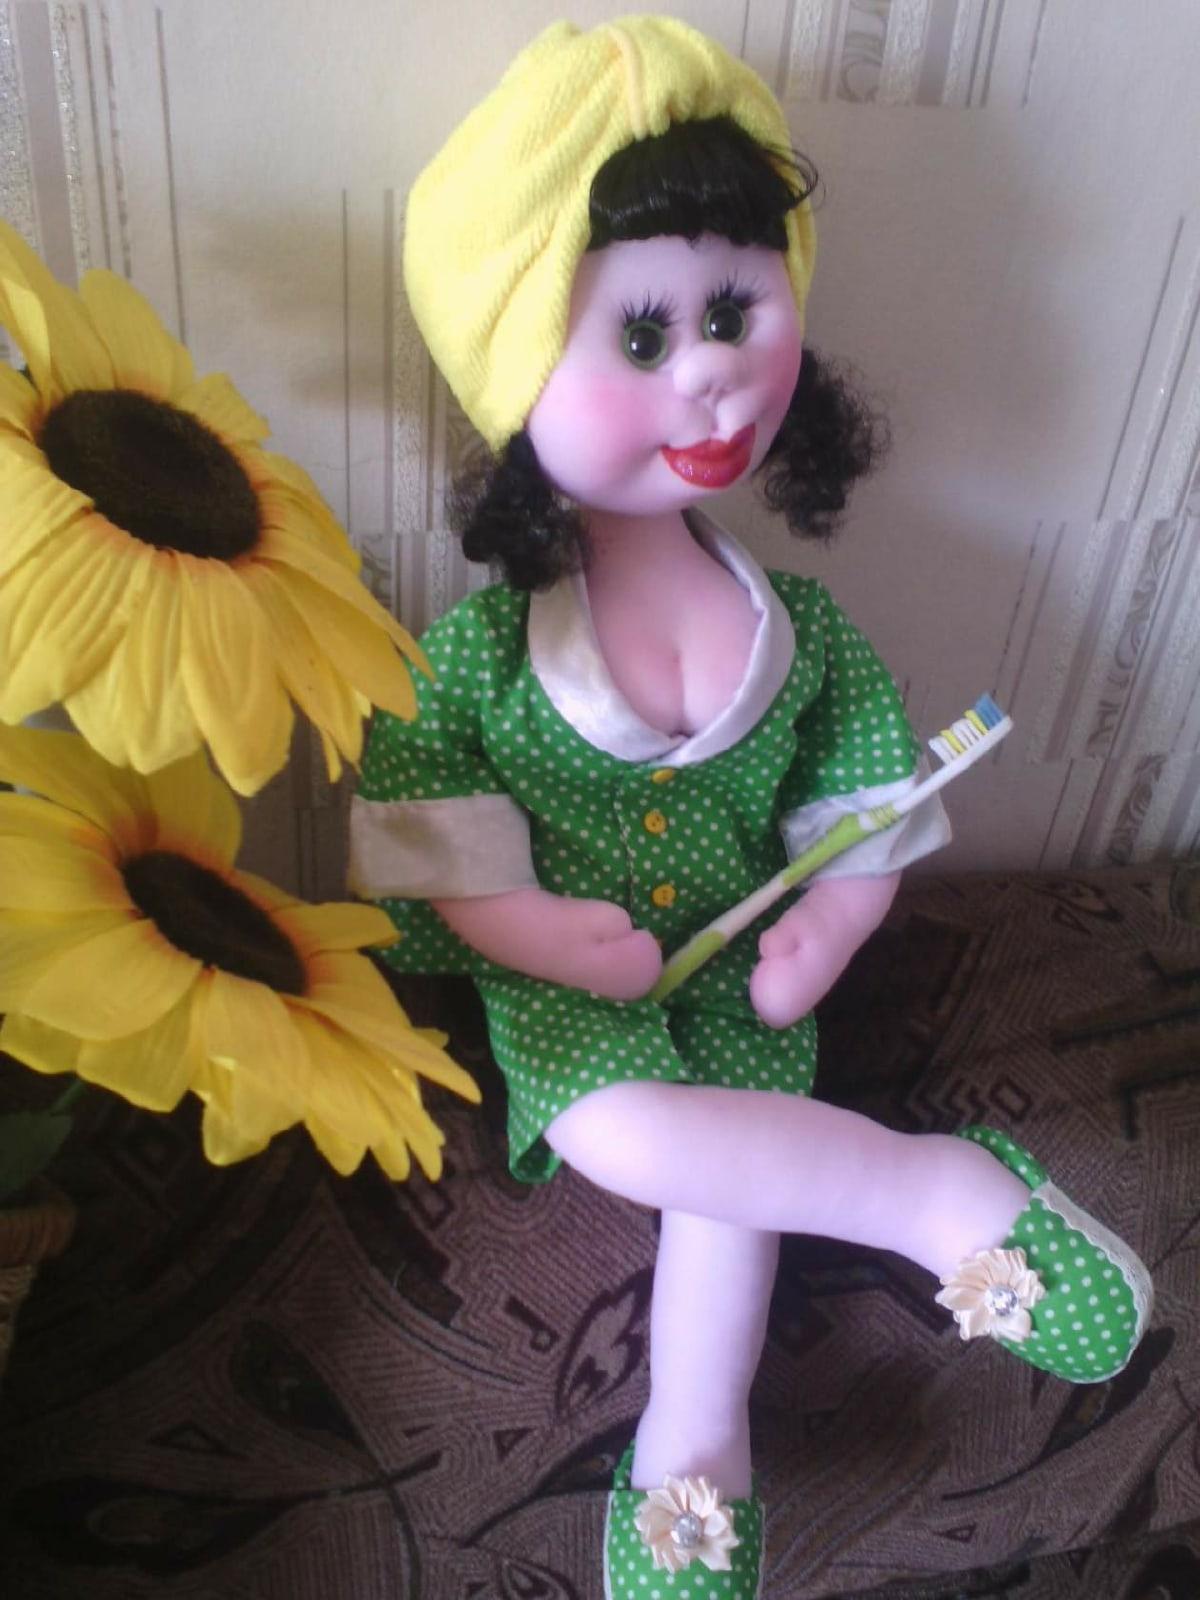 Лариса Михайловна Шапорева, 1953 г. р. Г. Лесосибирск п. Стрелка Кукла «Маруся», 2018 г. Синтепон, капрон, ткань, 75 см